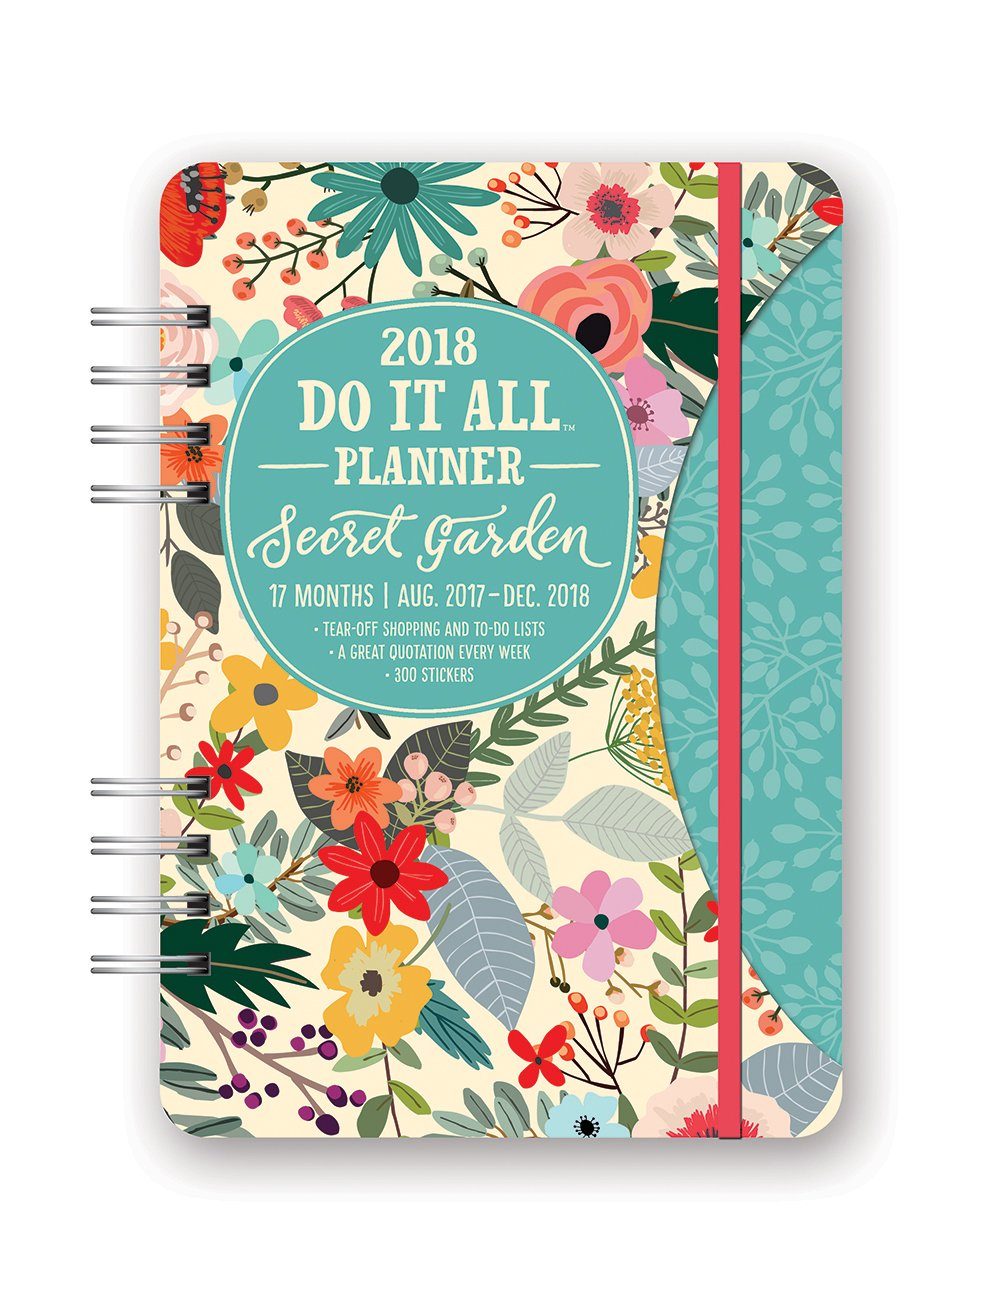 Secret Garden Do It All 17-Month 2018 Planner (Diary Engagement)